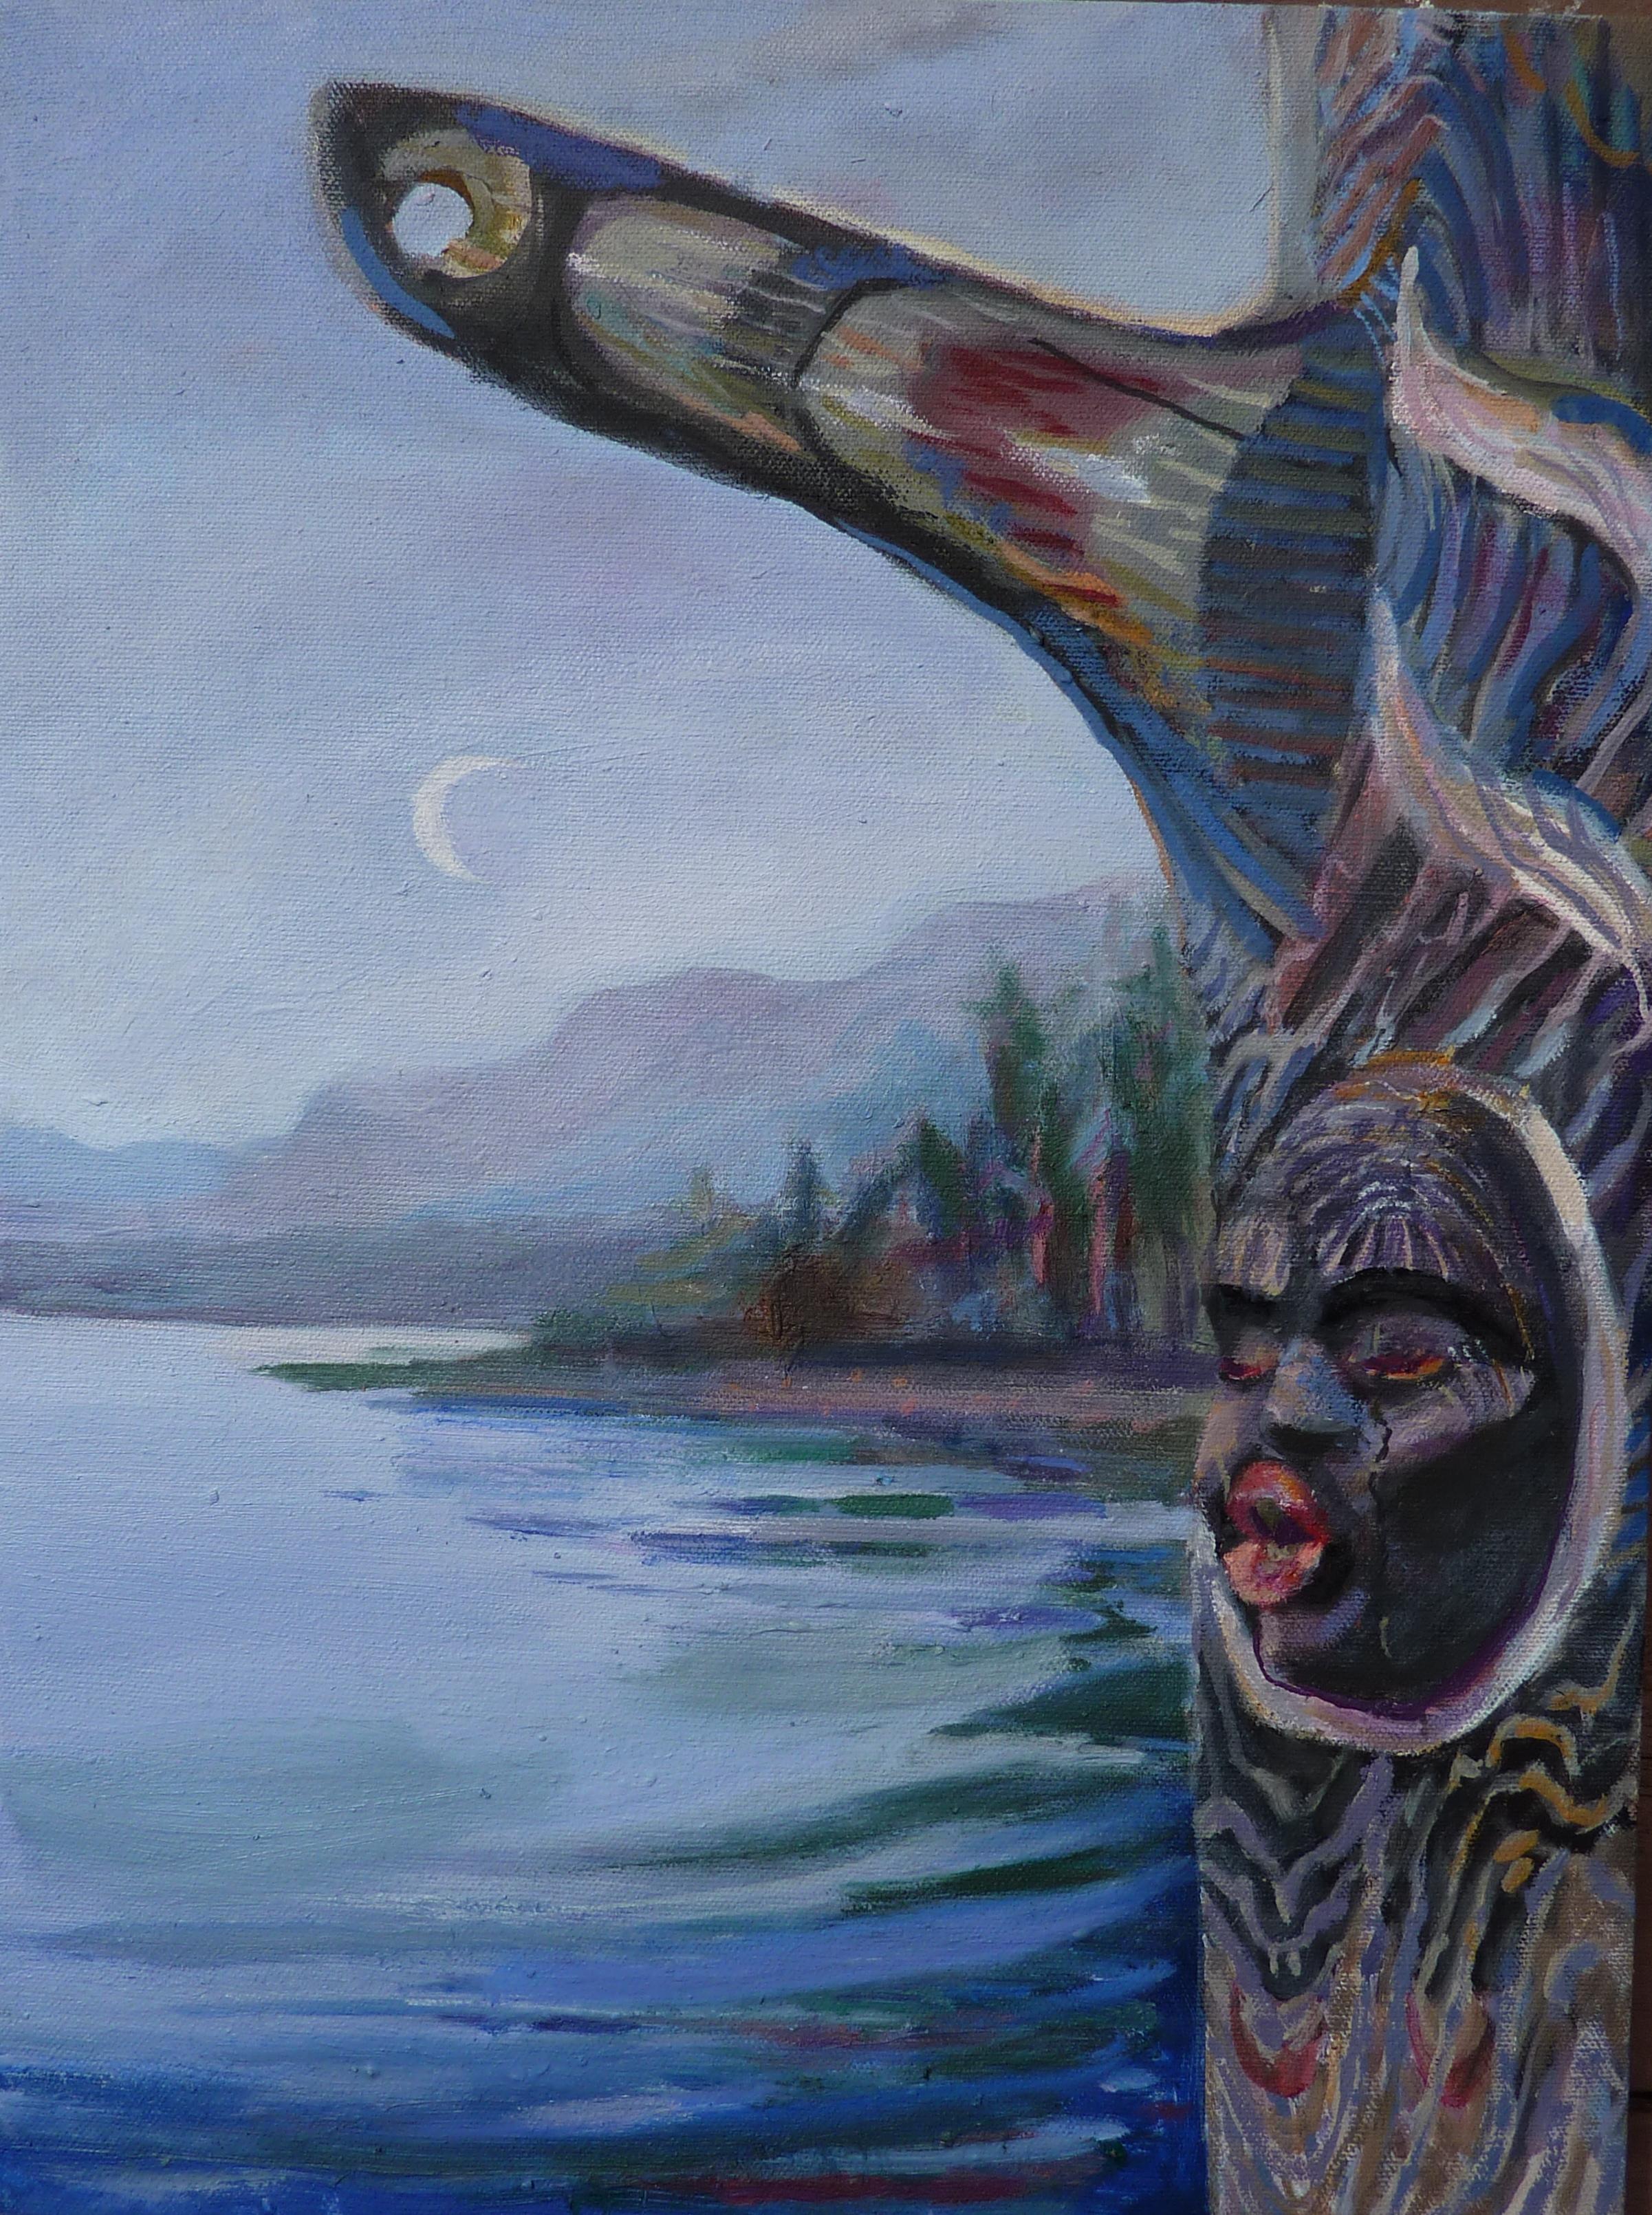 Orca Blow Hole Totem, 17 x 13, Acrylic